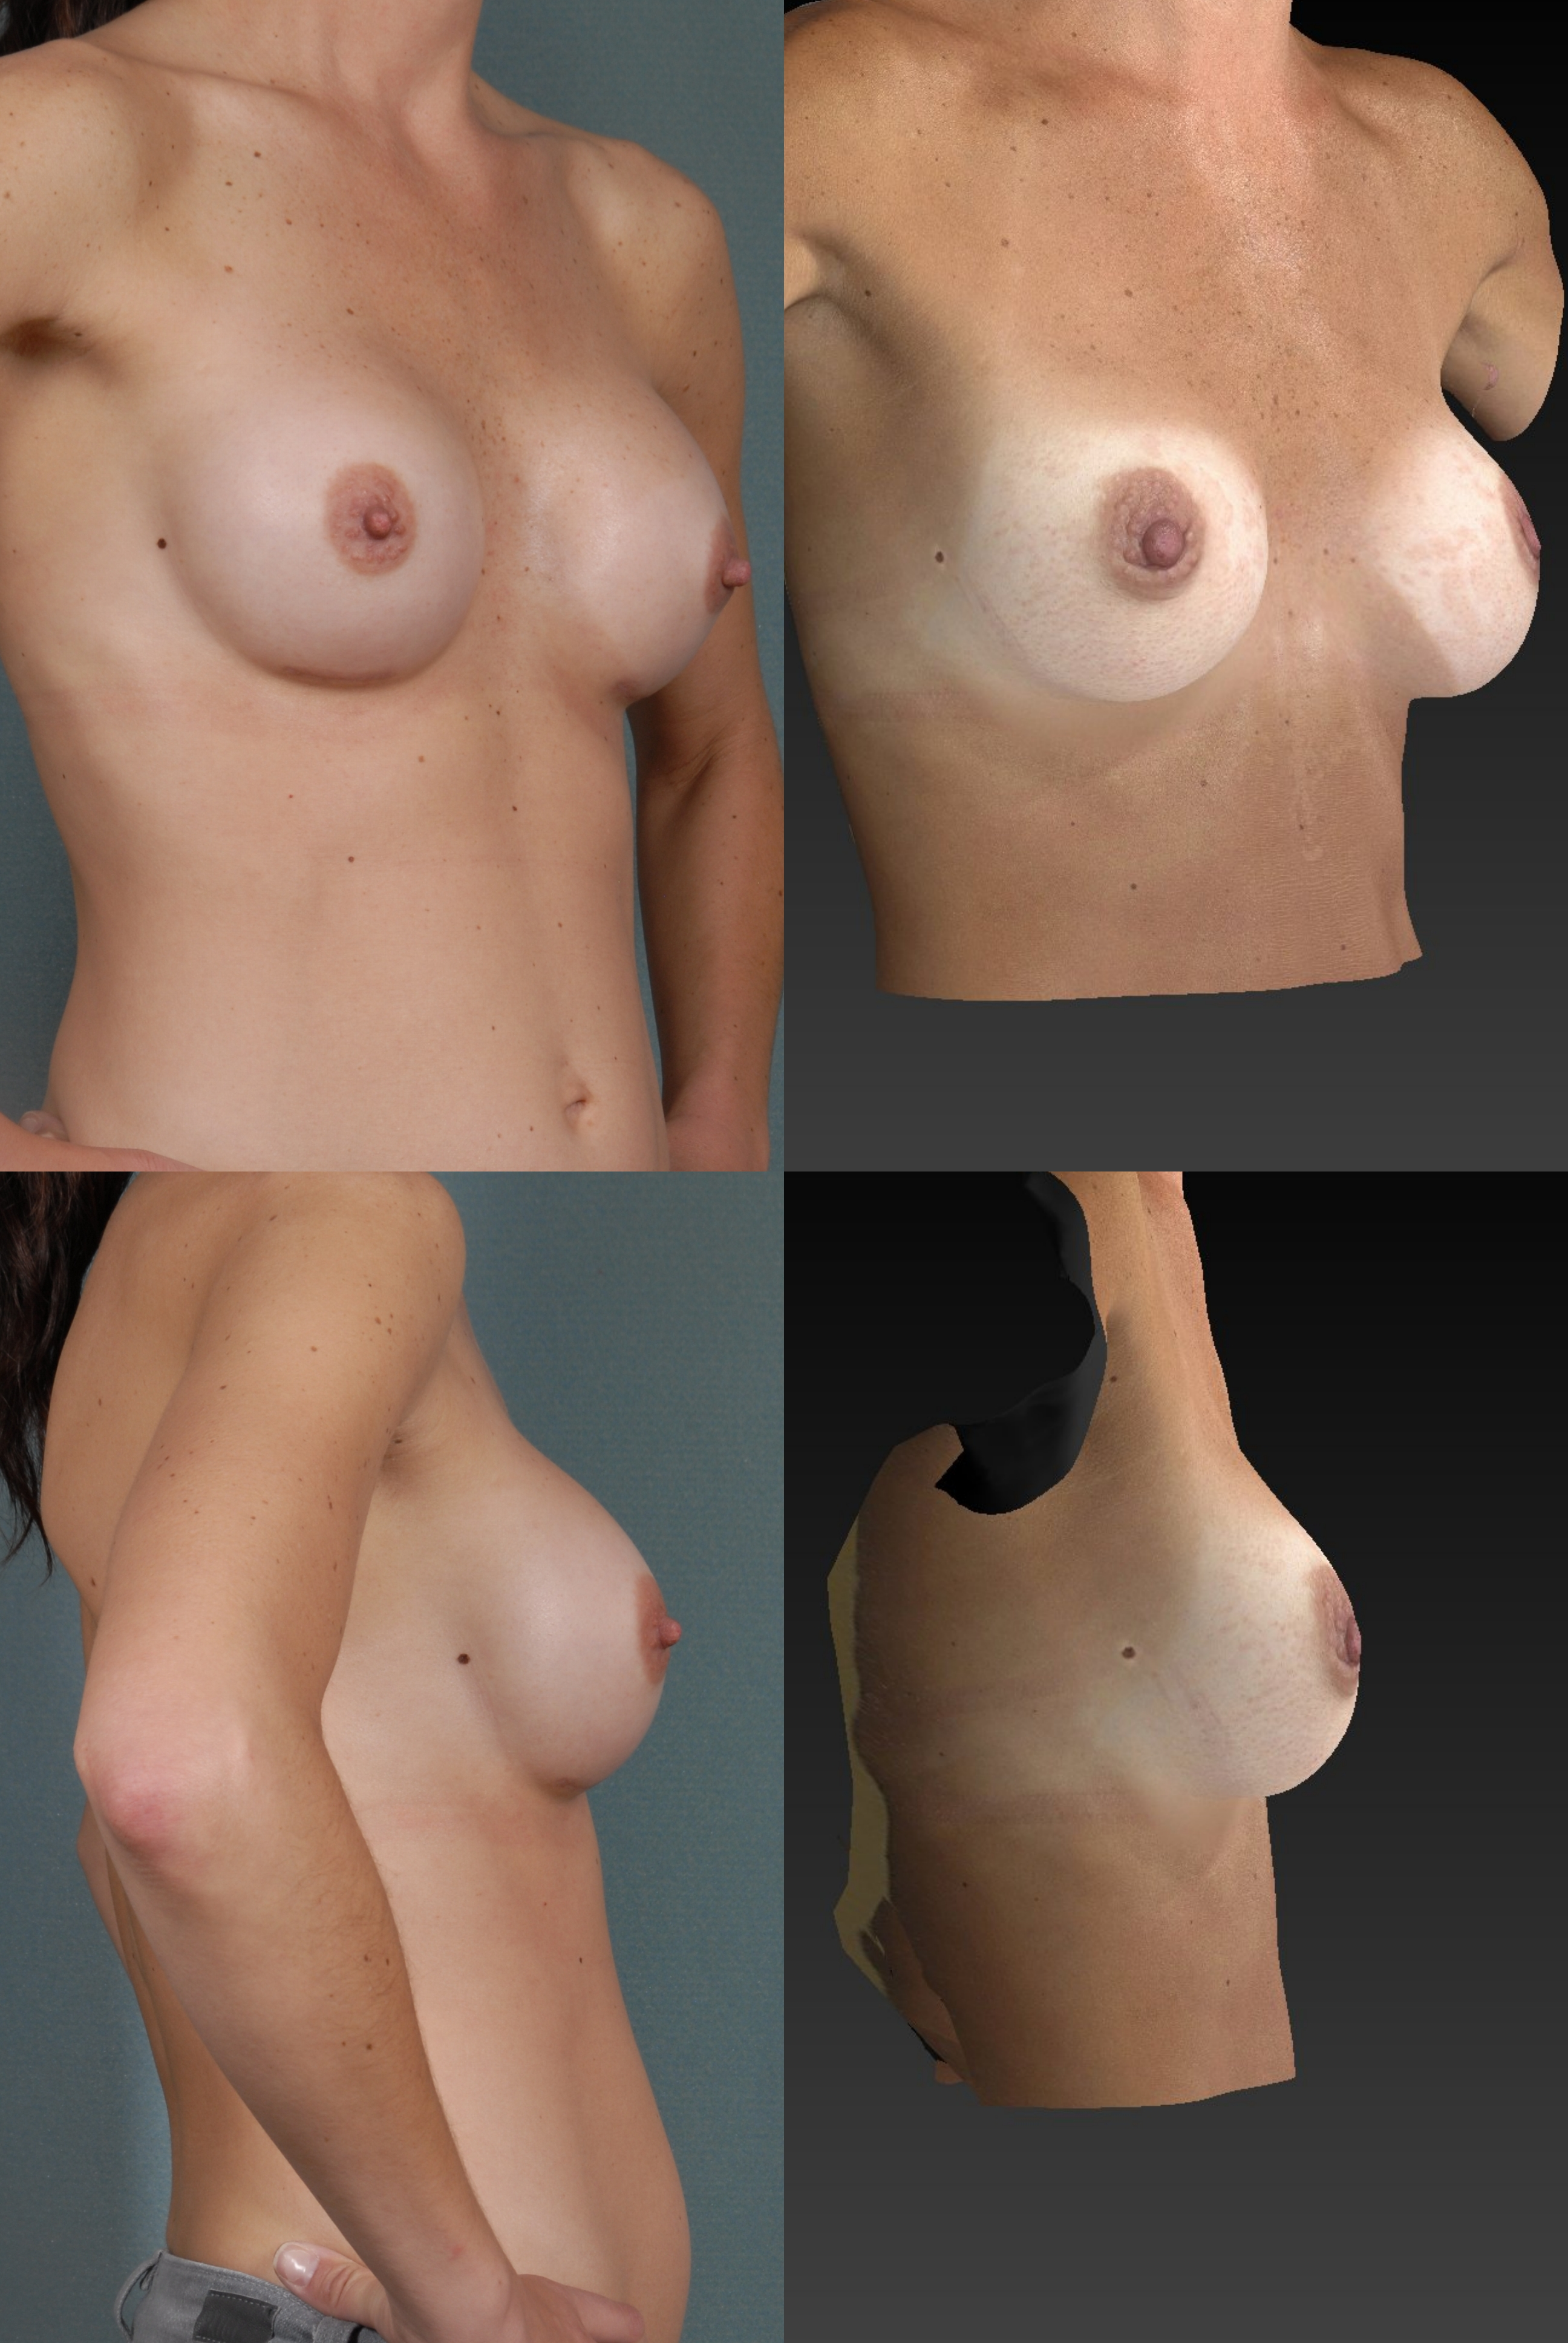 Denver breast augmentation 3D photo simulation